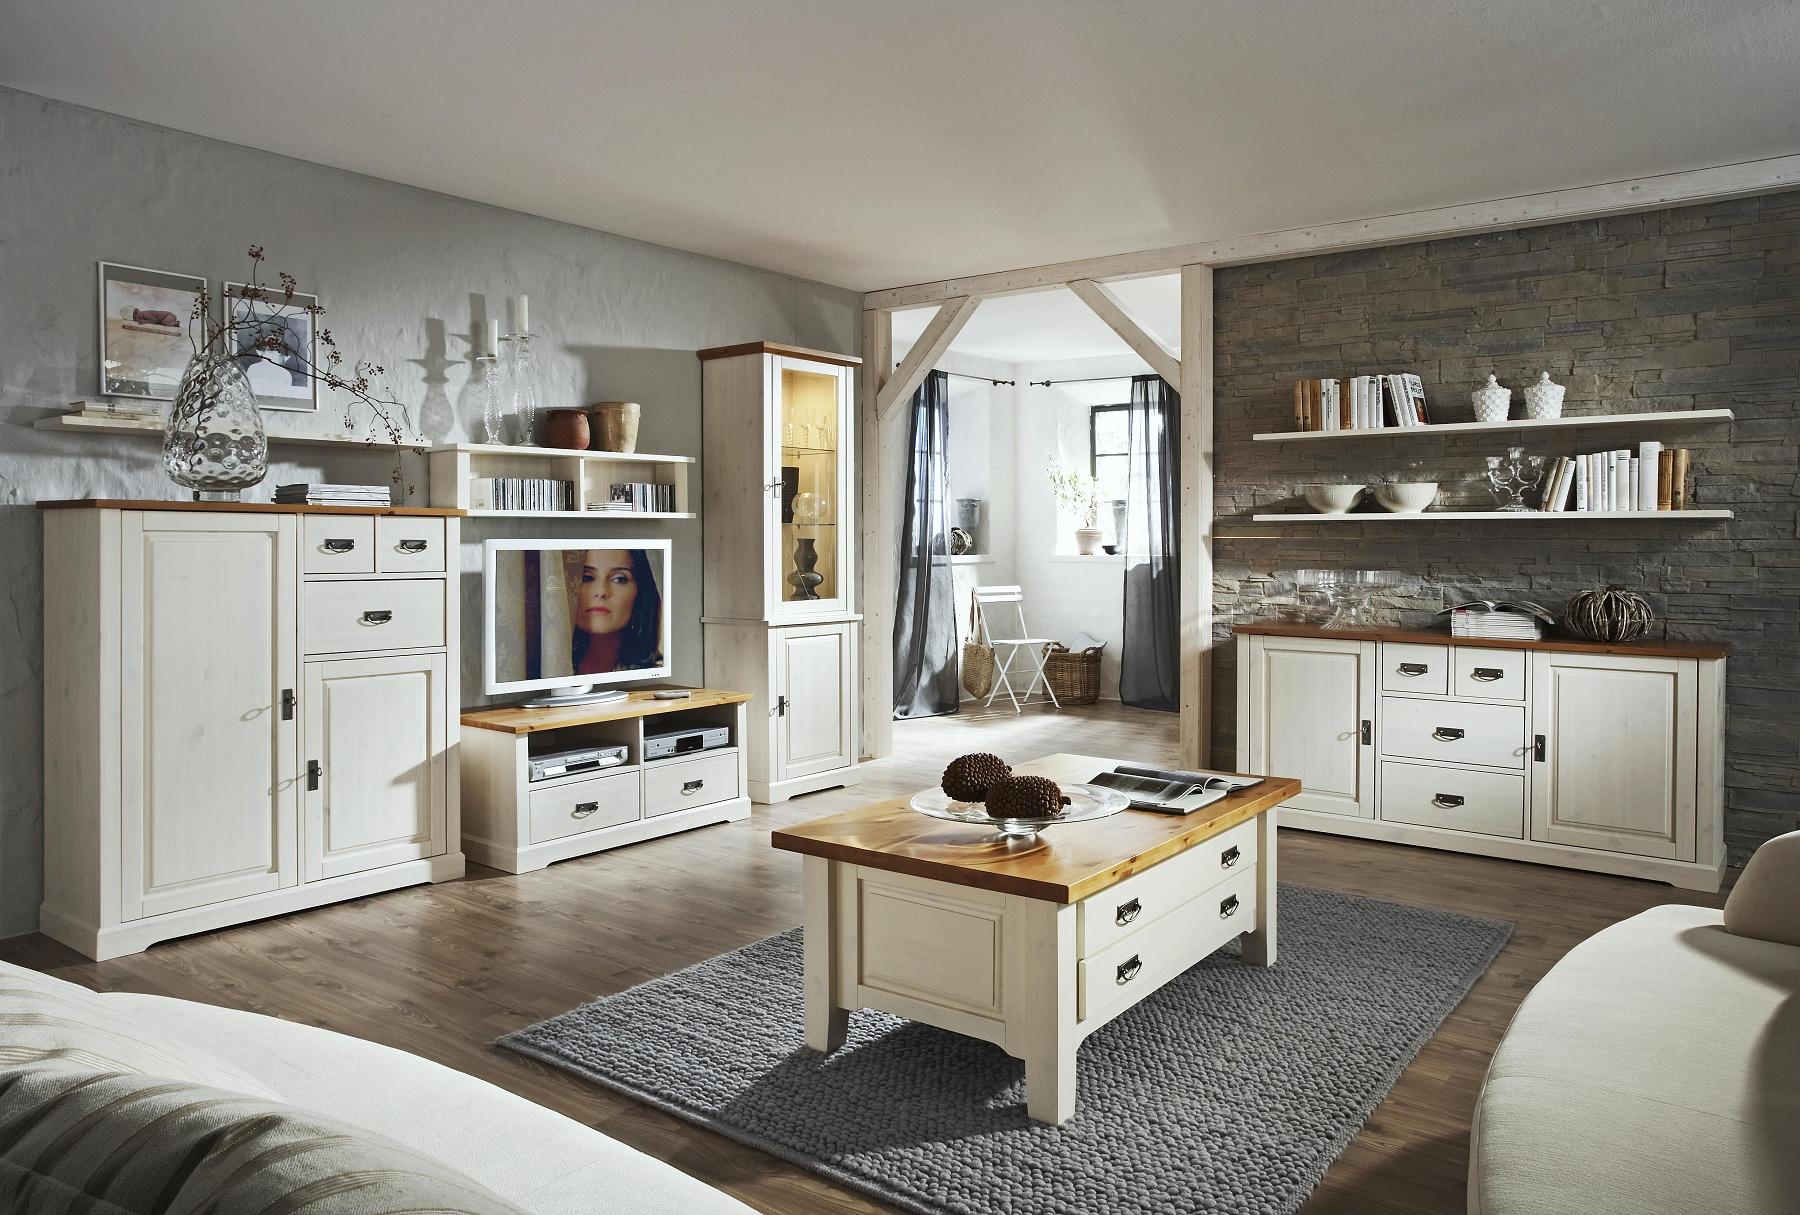 country inn ob vac pokoj sestava bic n bytek. Black Bedroom Furniture Sets. Home Design Ideas